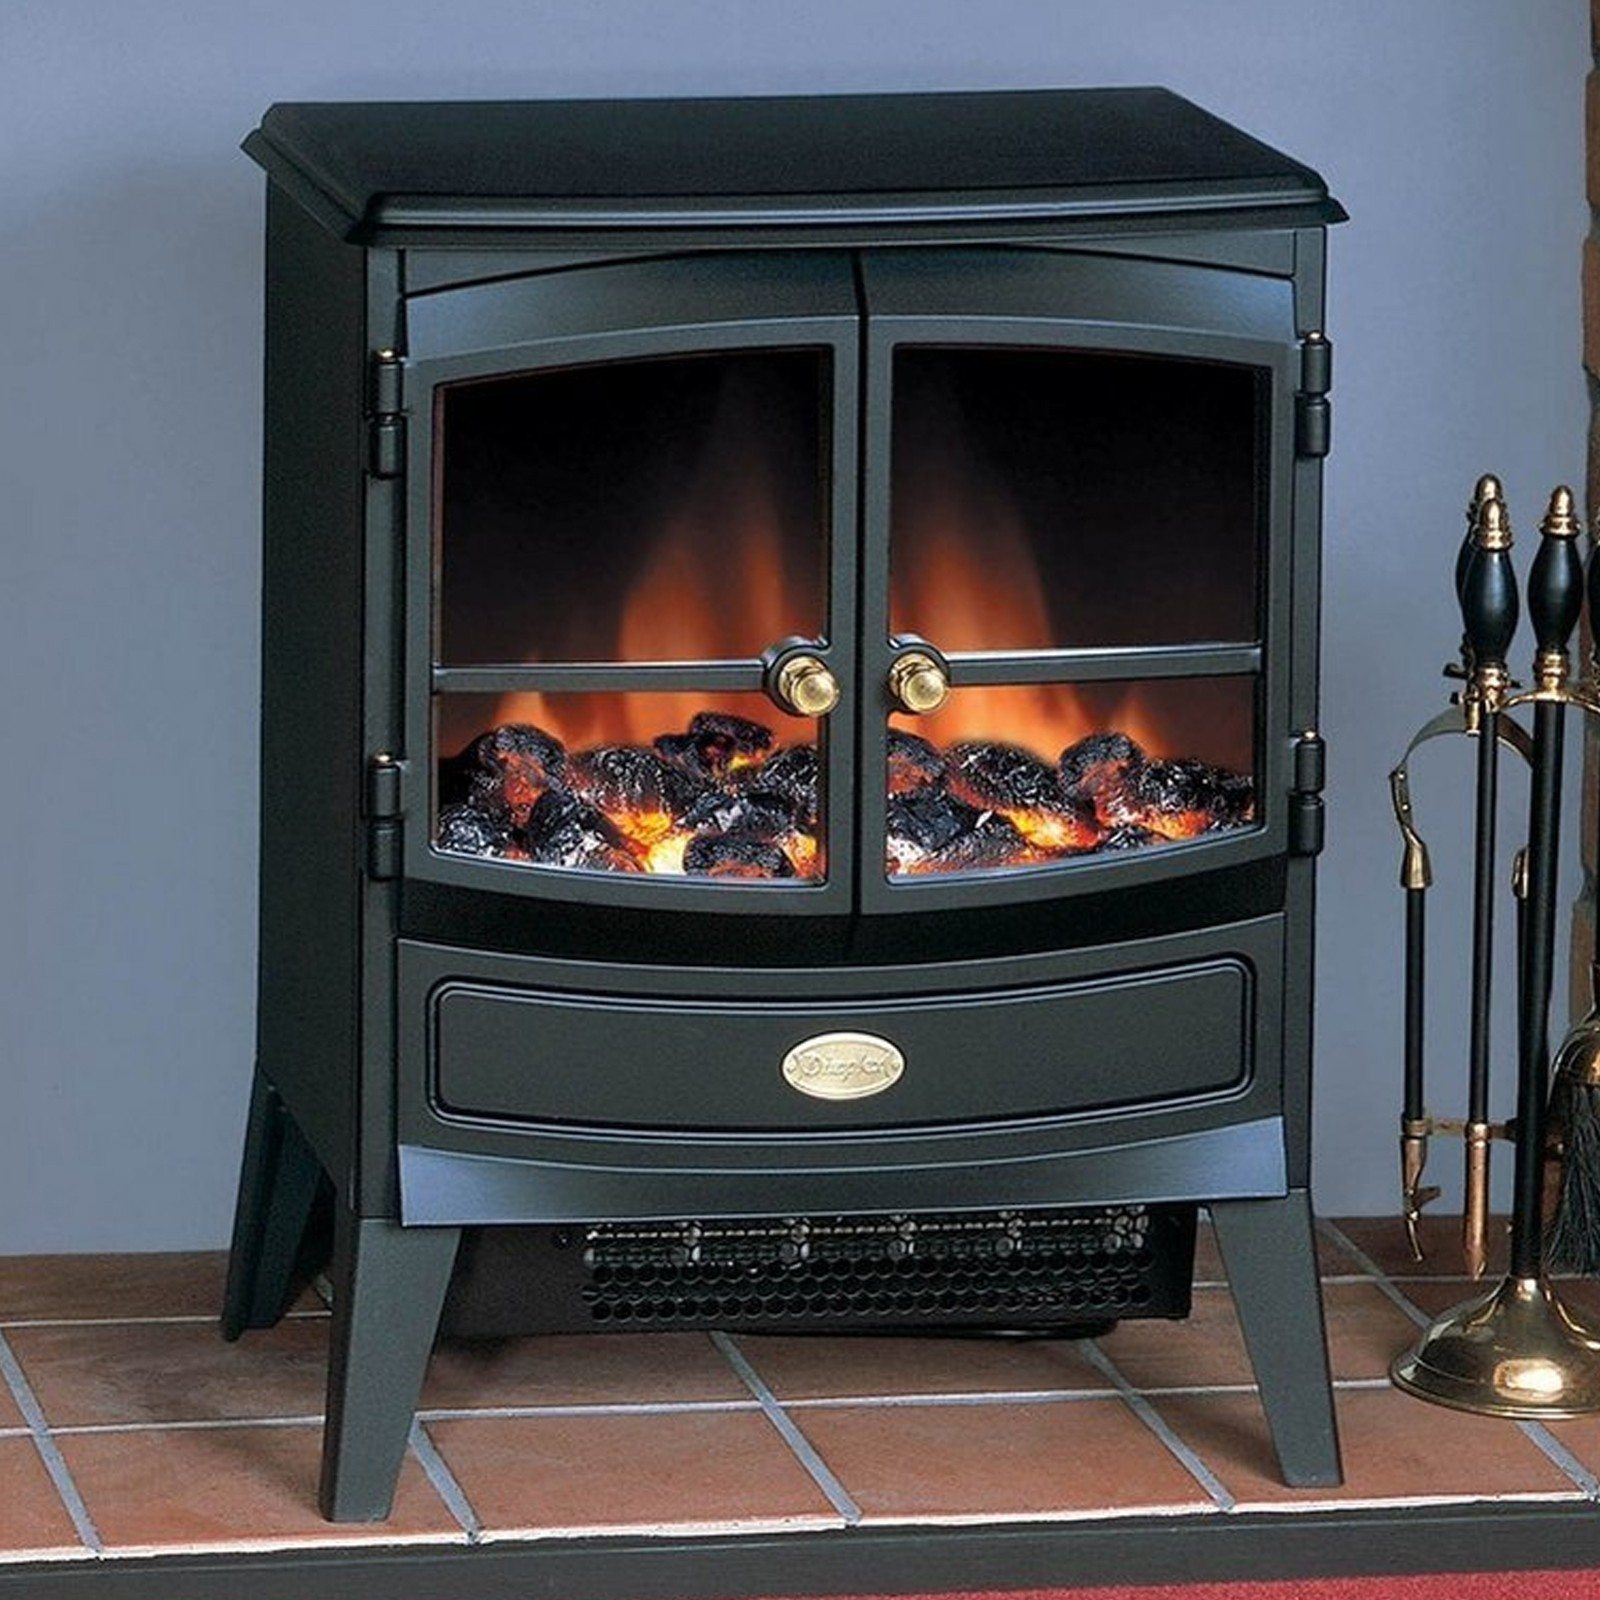 electric stove aiphone c ml wiring diagram sleek dimplex springborne black optiflame